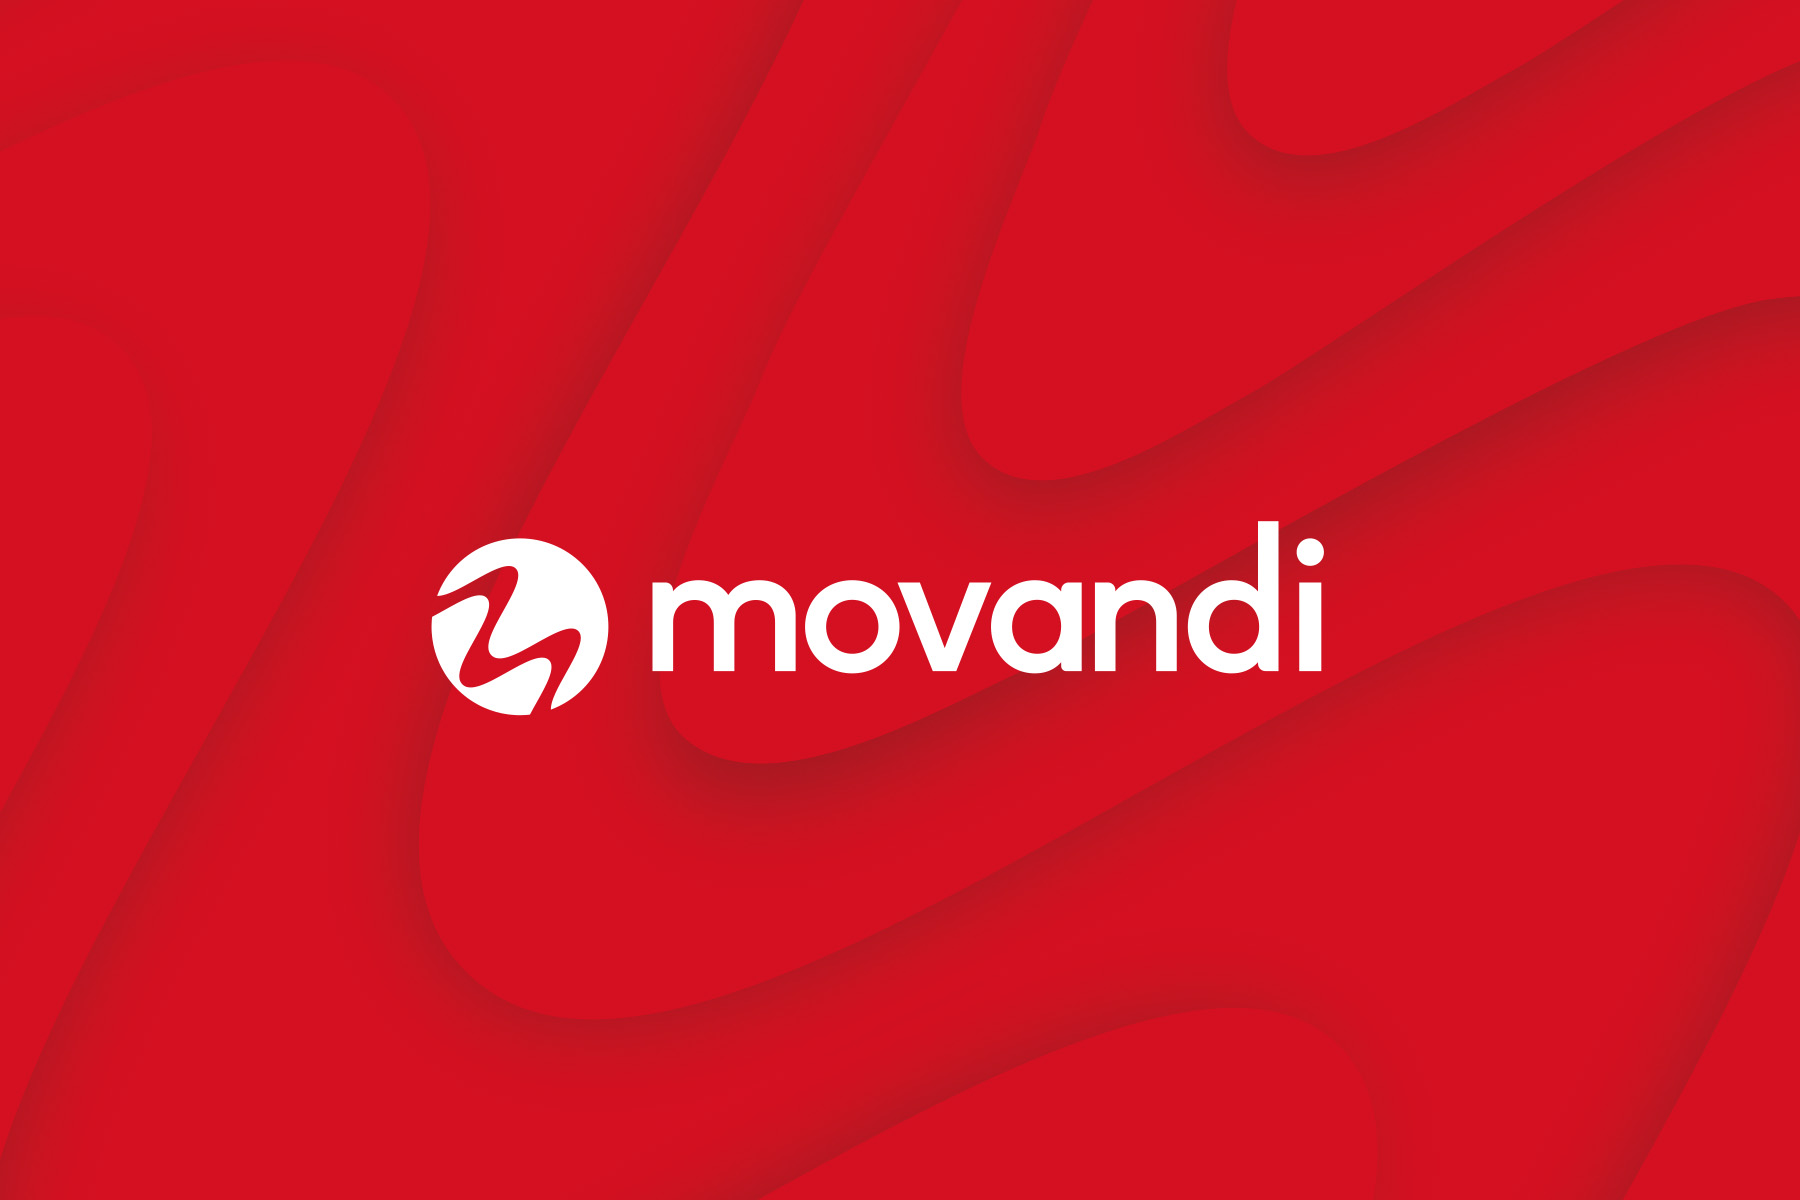 Mvandi_Brand_02